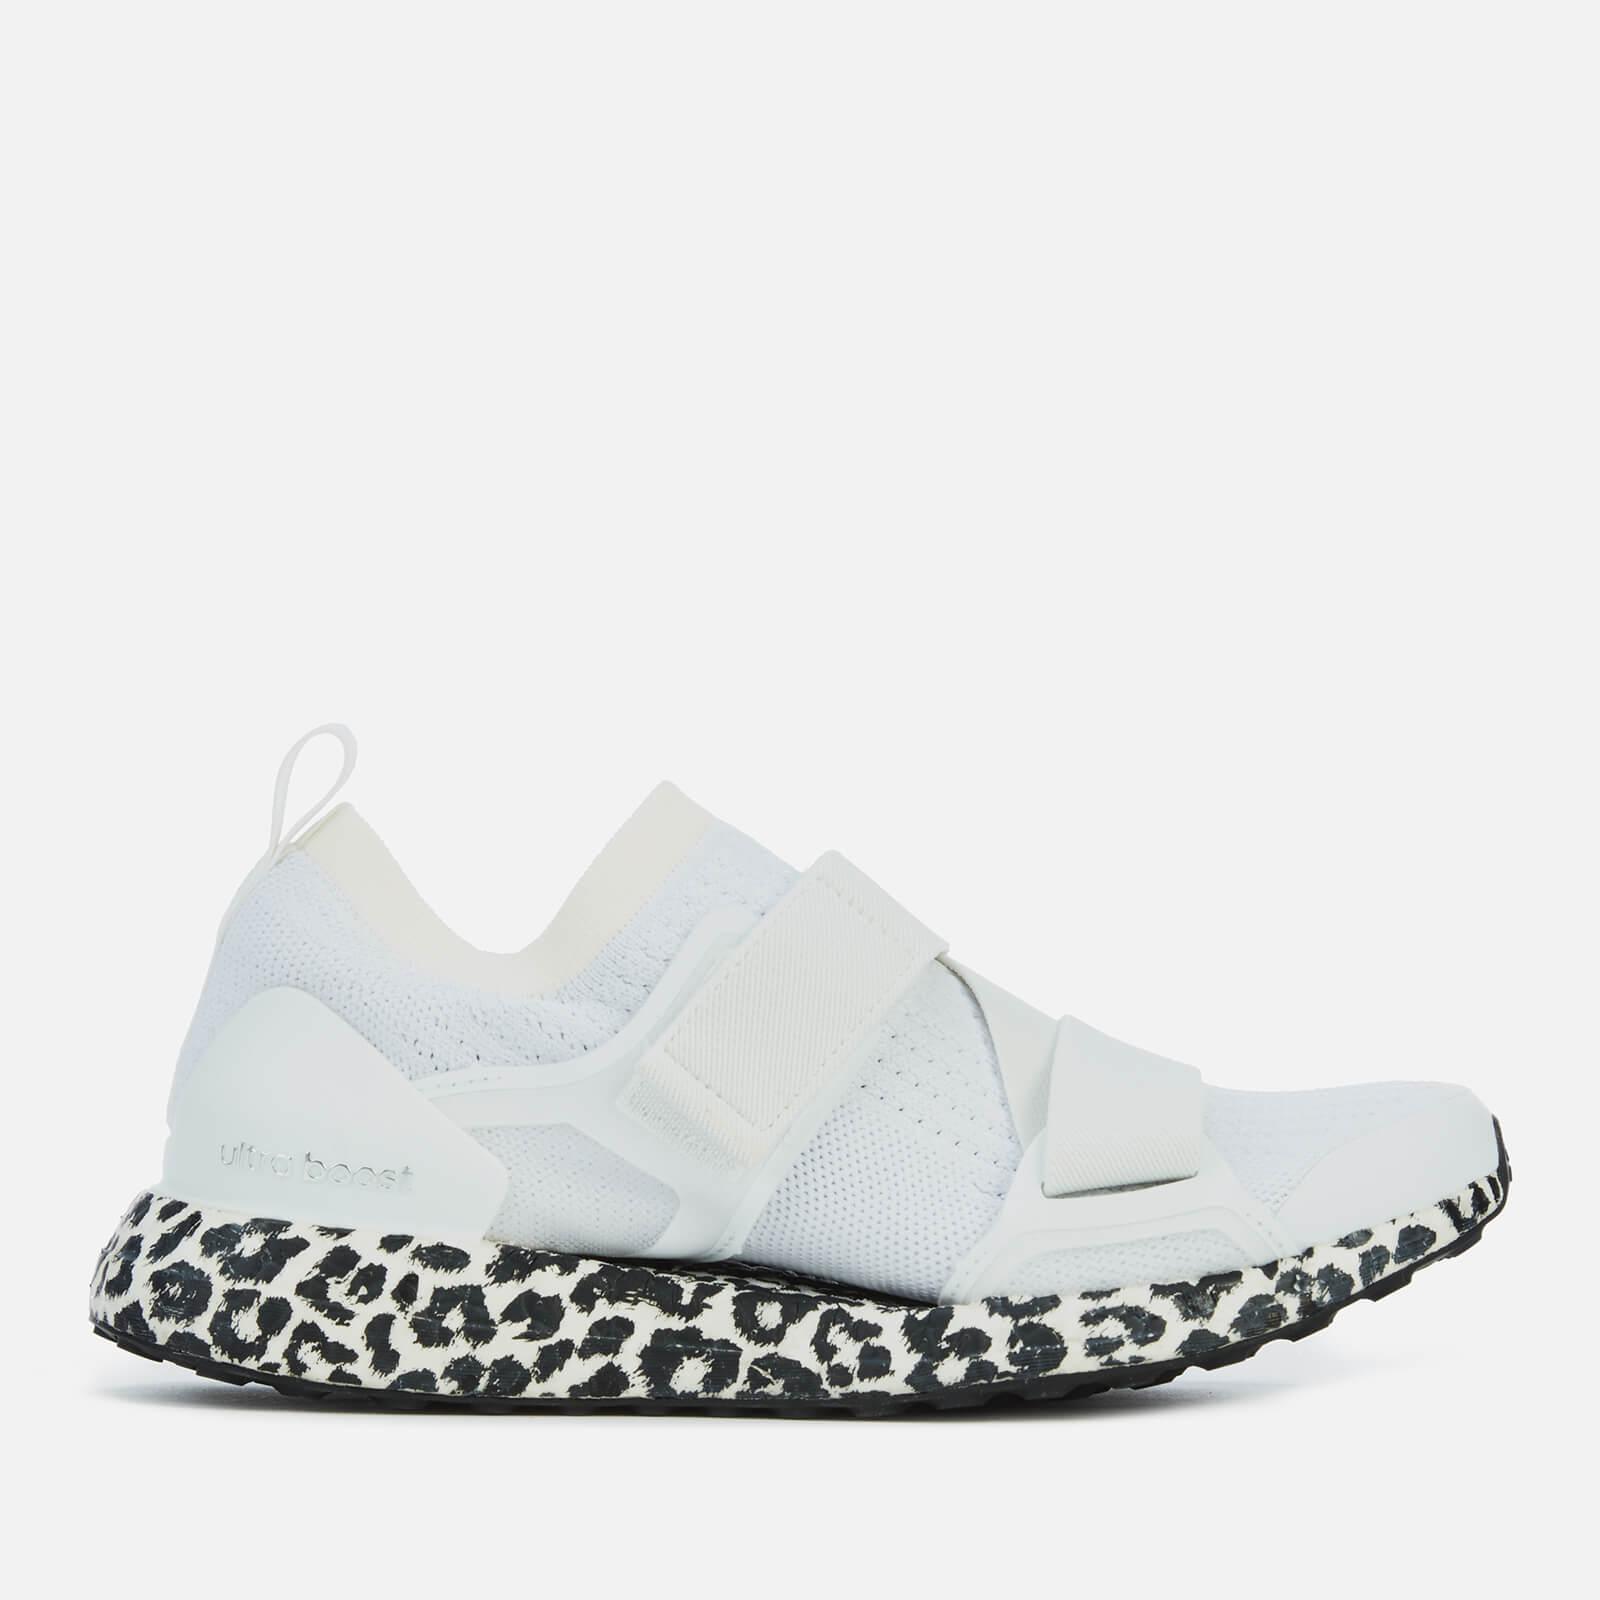 3e969b75bc9ff ... adidas by Stella McCartney Women s Ultraboost X Trainers - White Black